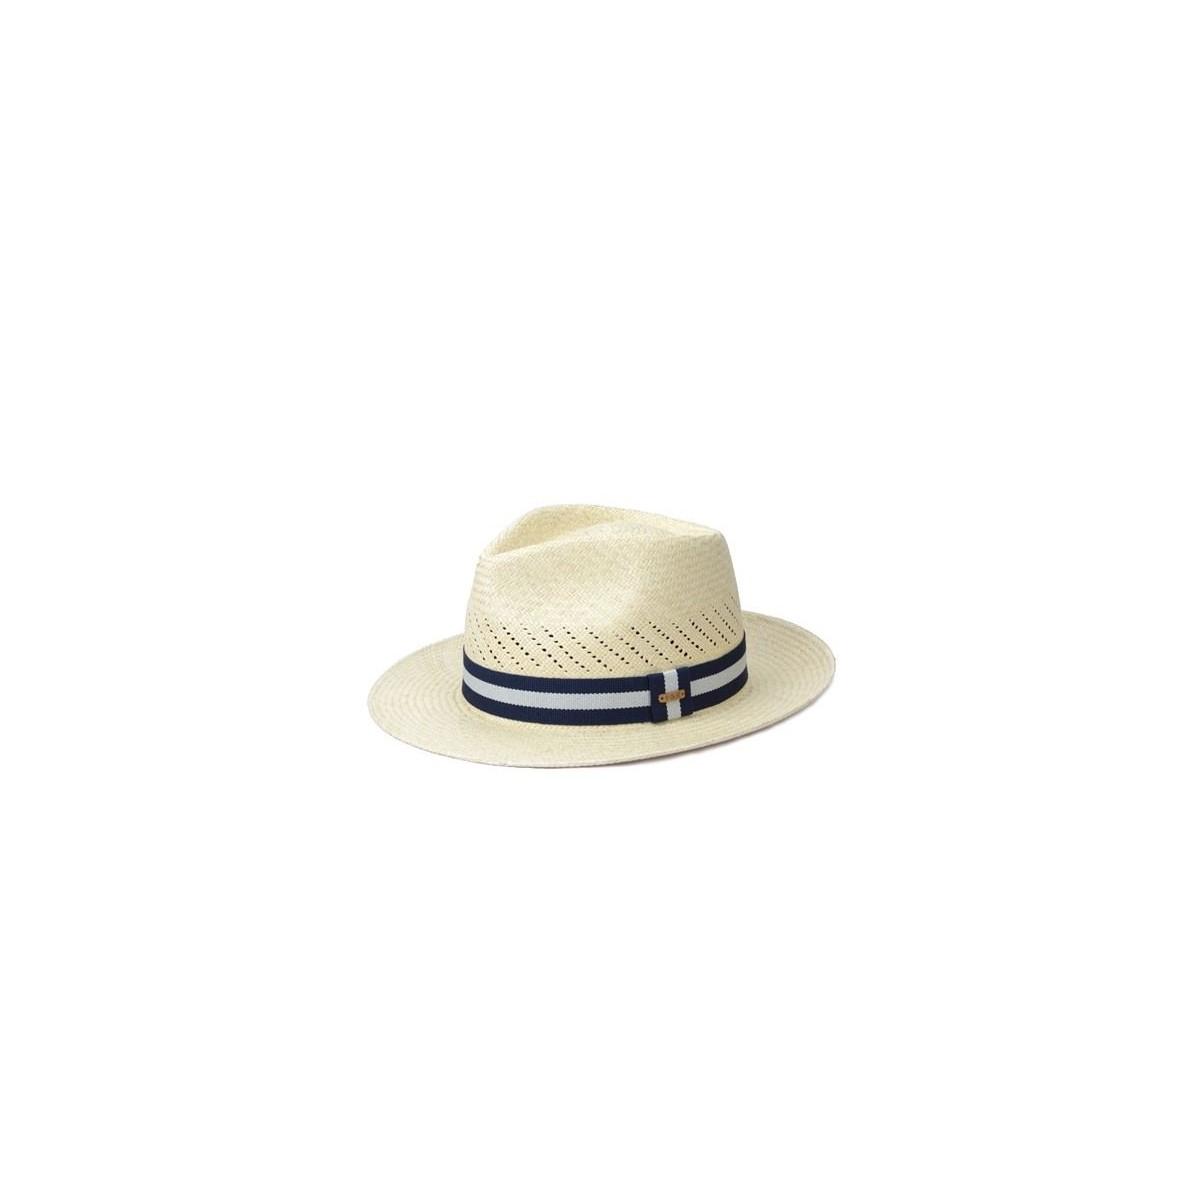 sombrero-hombre-panama-sabila-paja-toquilla-natural-Fernandez-y-Roche